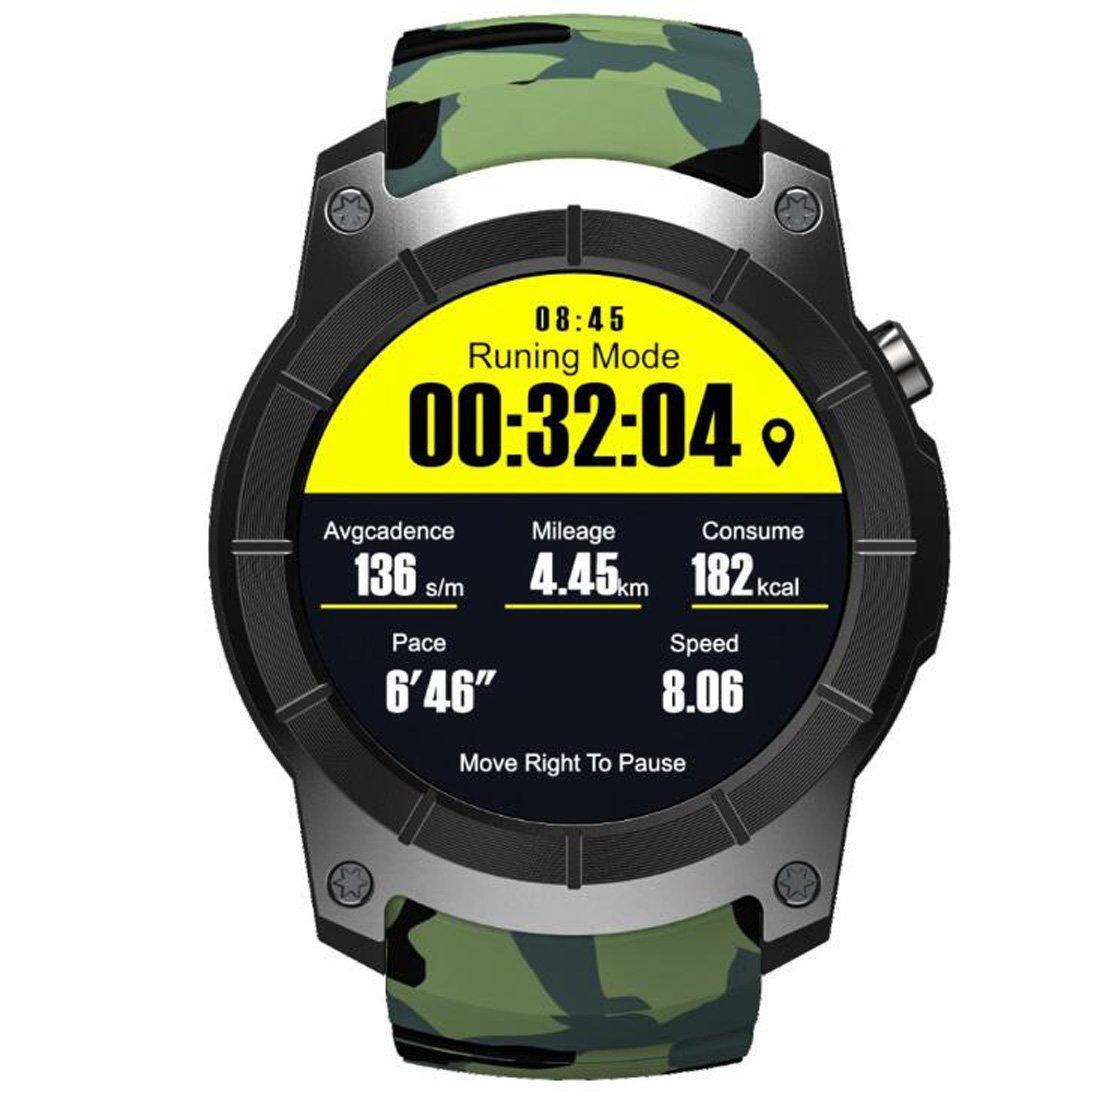 Amazon.com : Smart Watch GPS Pressure Variety of Sports Mode ...